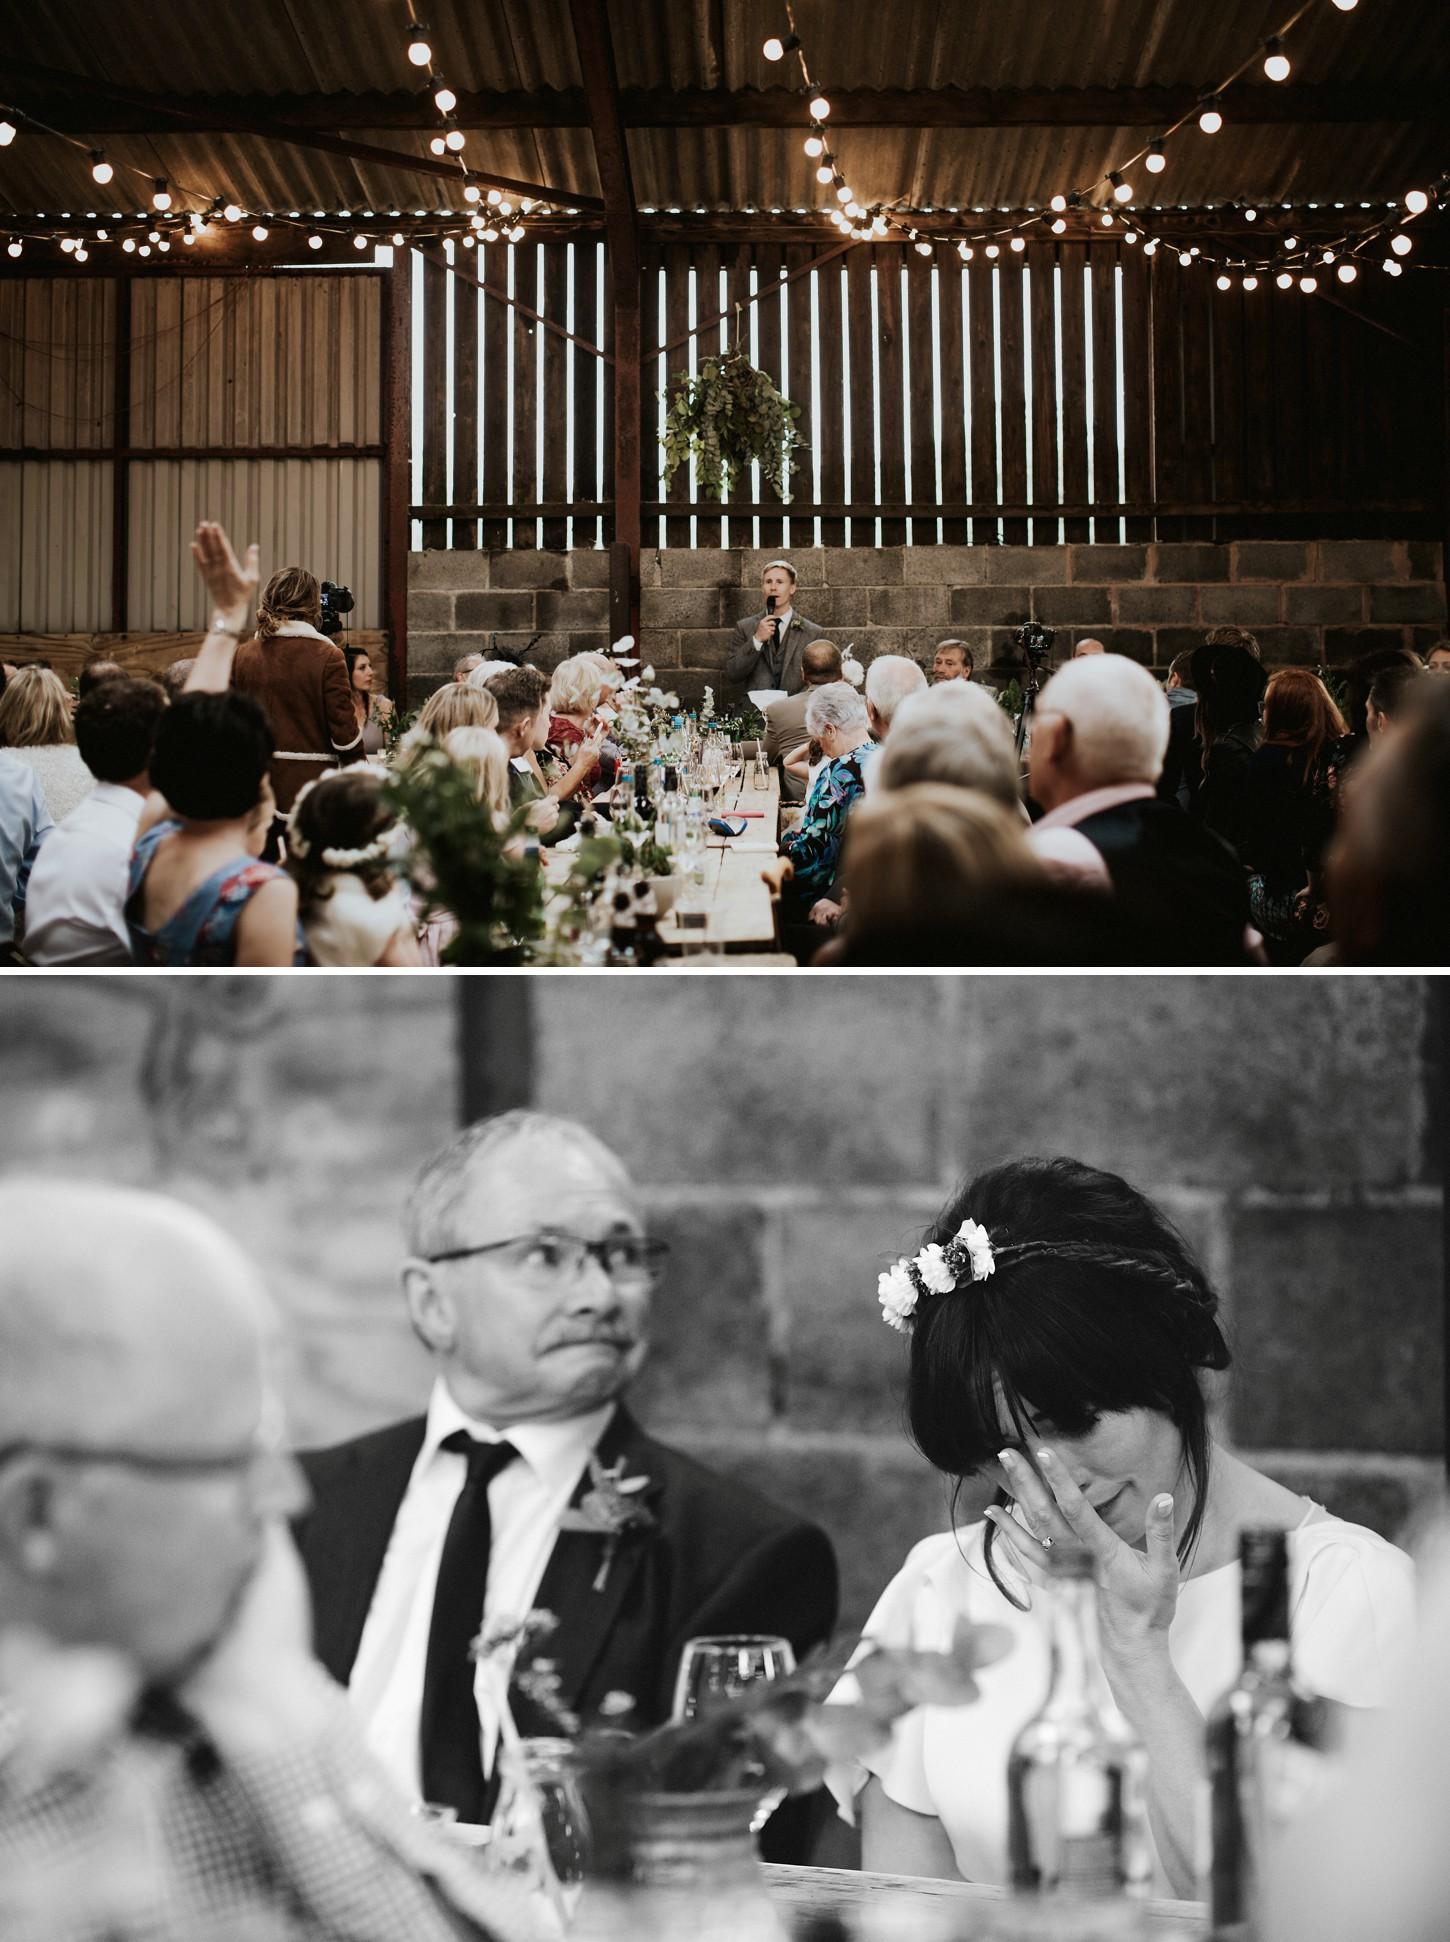 Dolau-Sheep-Farm-Wedding-Wales-United-Kingdom-036